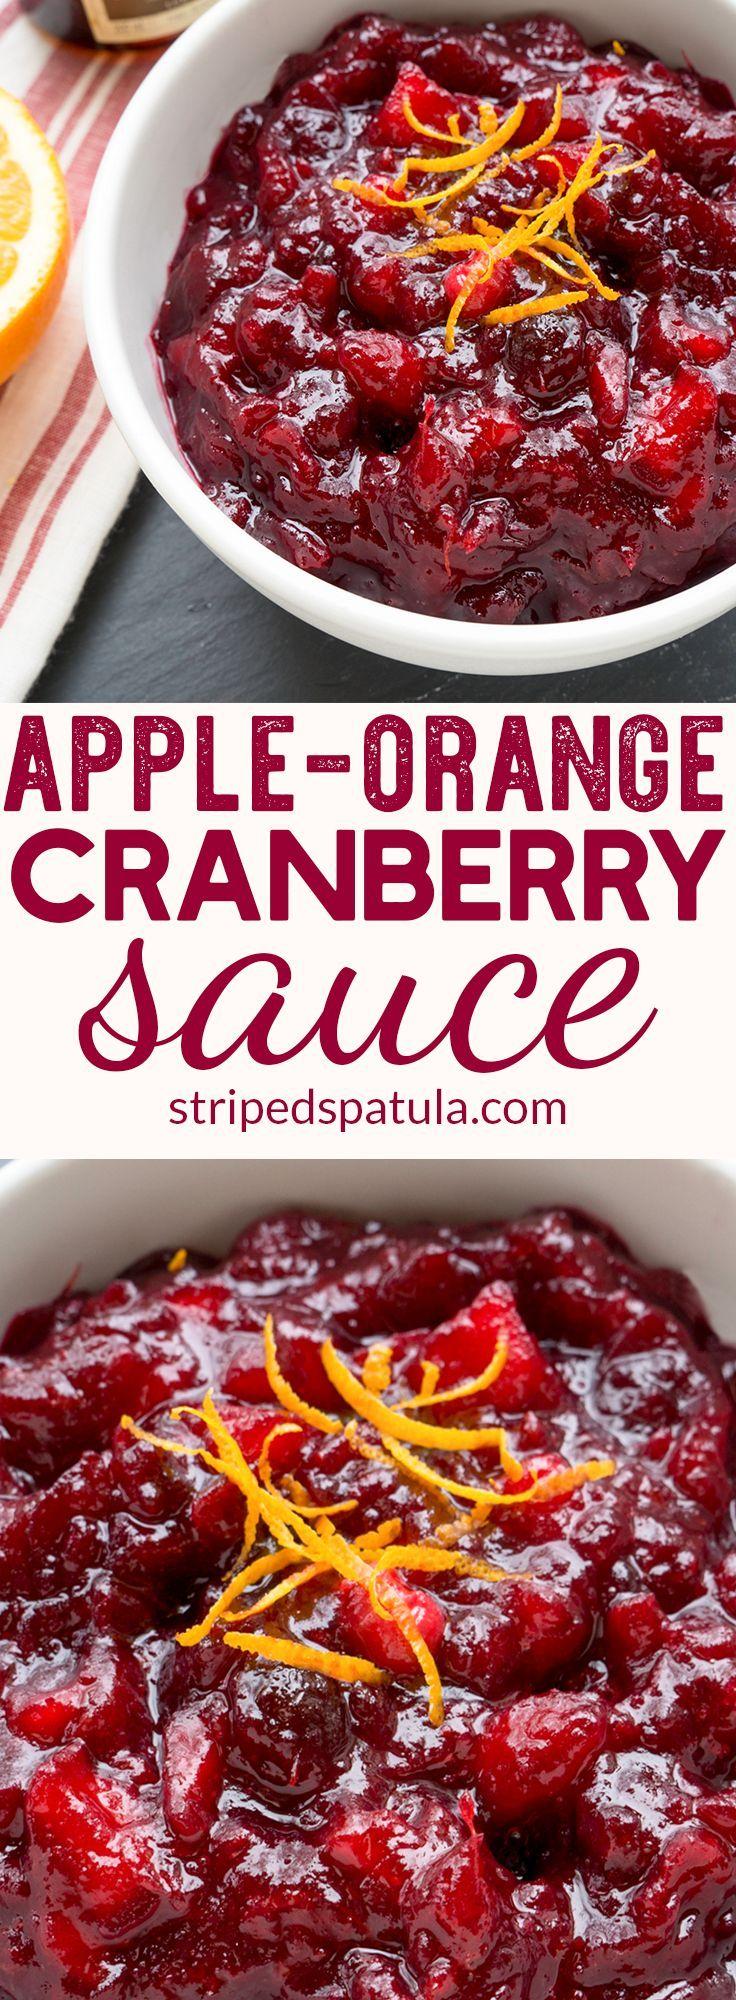 Apple Orange Cranberry Sauce Recipe | Thanksgiving Sides Easy | Cranberry Sauce …